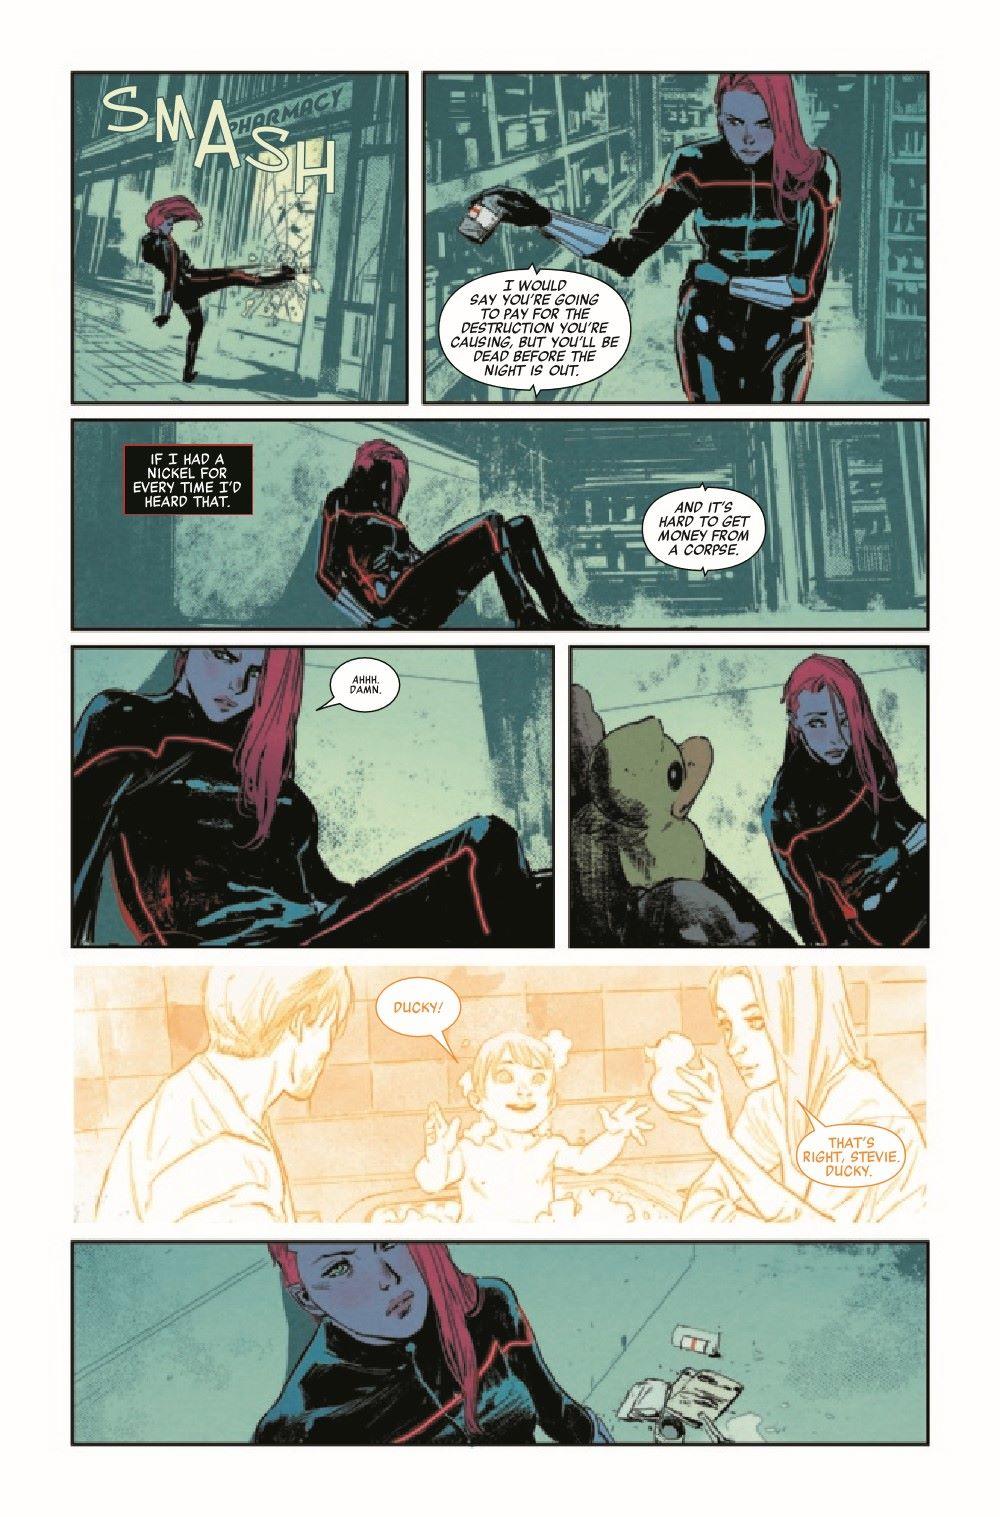 BLAW2020006_Preview-6 ComicList Previews: BLACK WIDOW #6